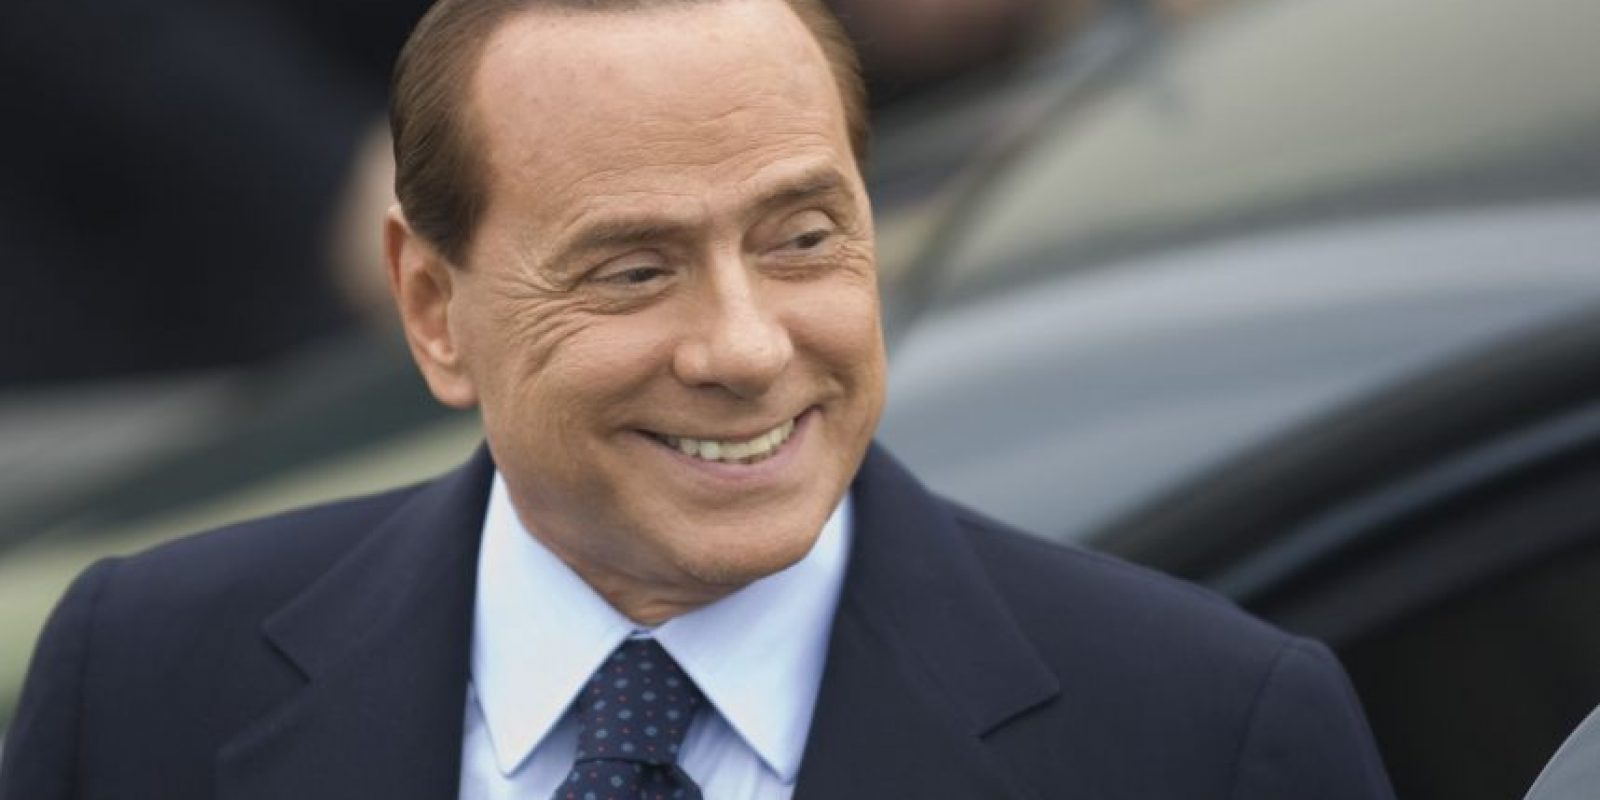 Esto facilitó la caída del entonces primer ministro Romano Prodi, quien fue sustituido por Berlusconi Foto:Getty Images